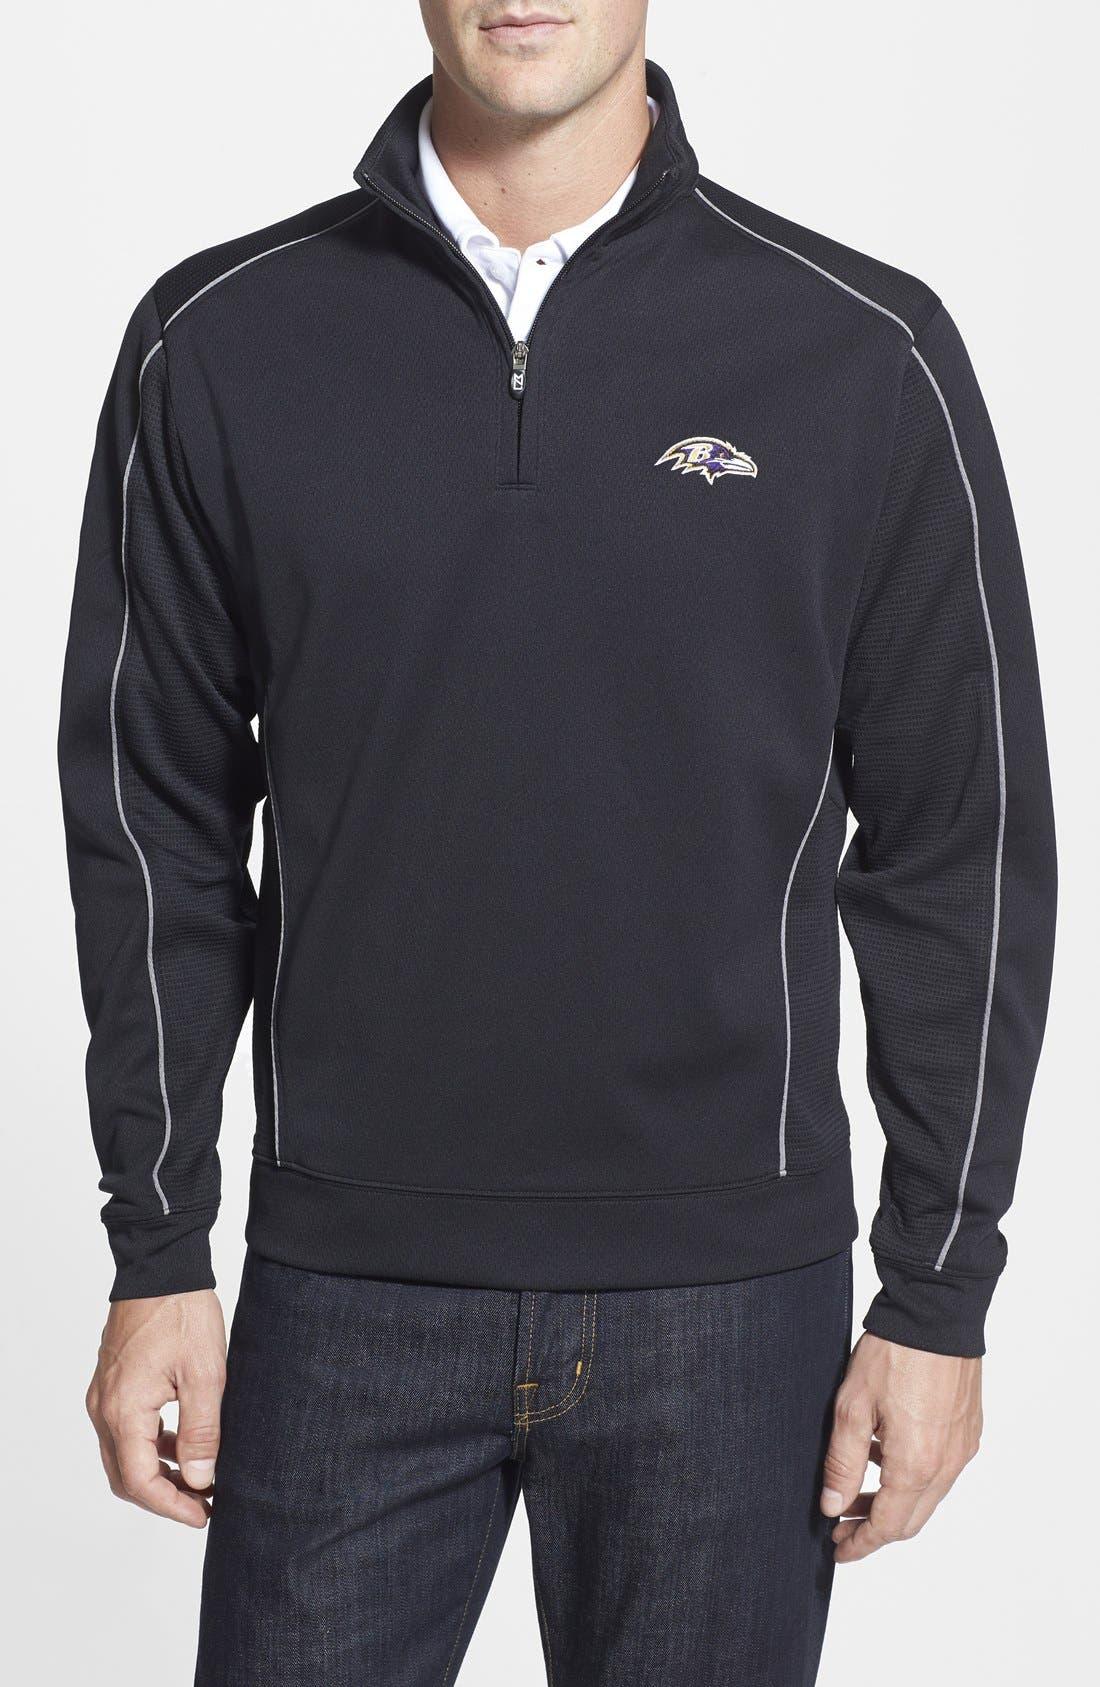 Cutter & Buck Baltimore Ravens - Edge DryTec Moisture Wicking Half Zip Pullover